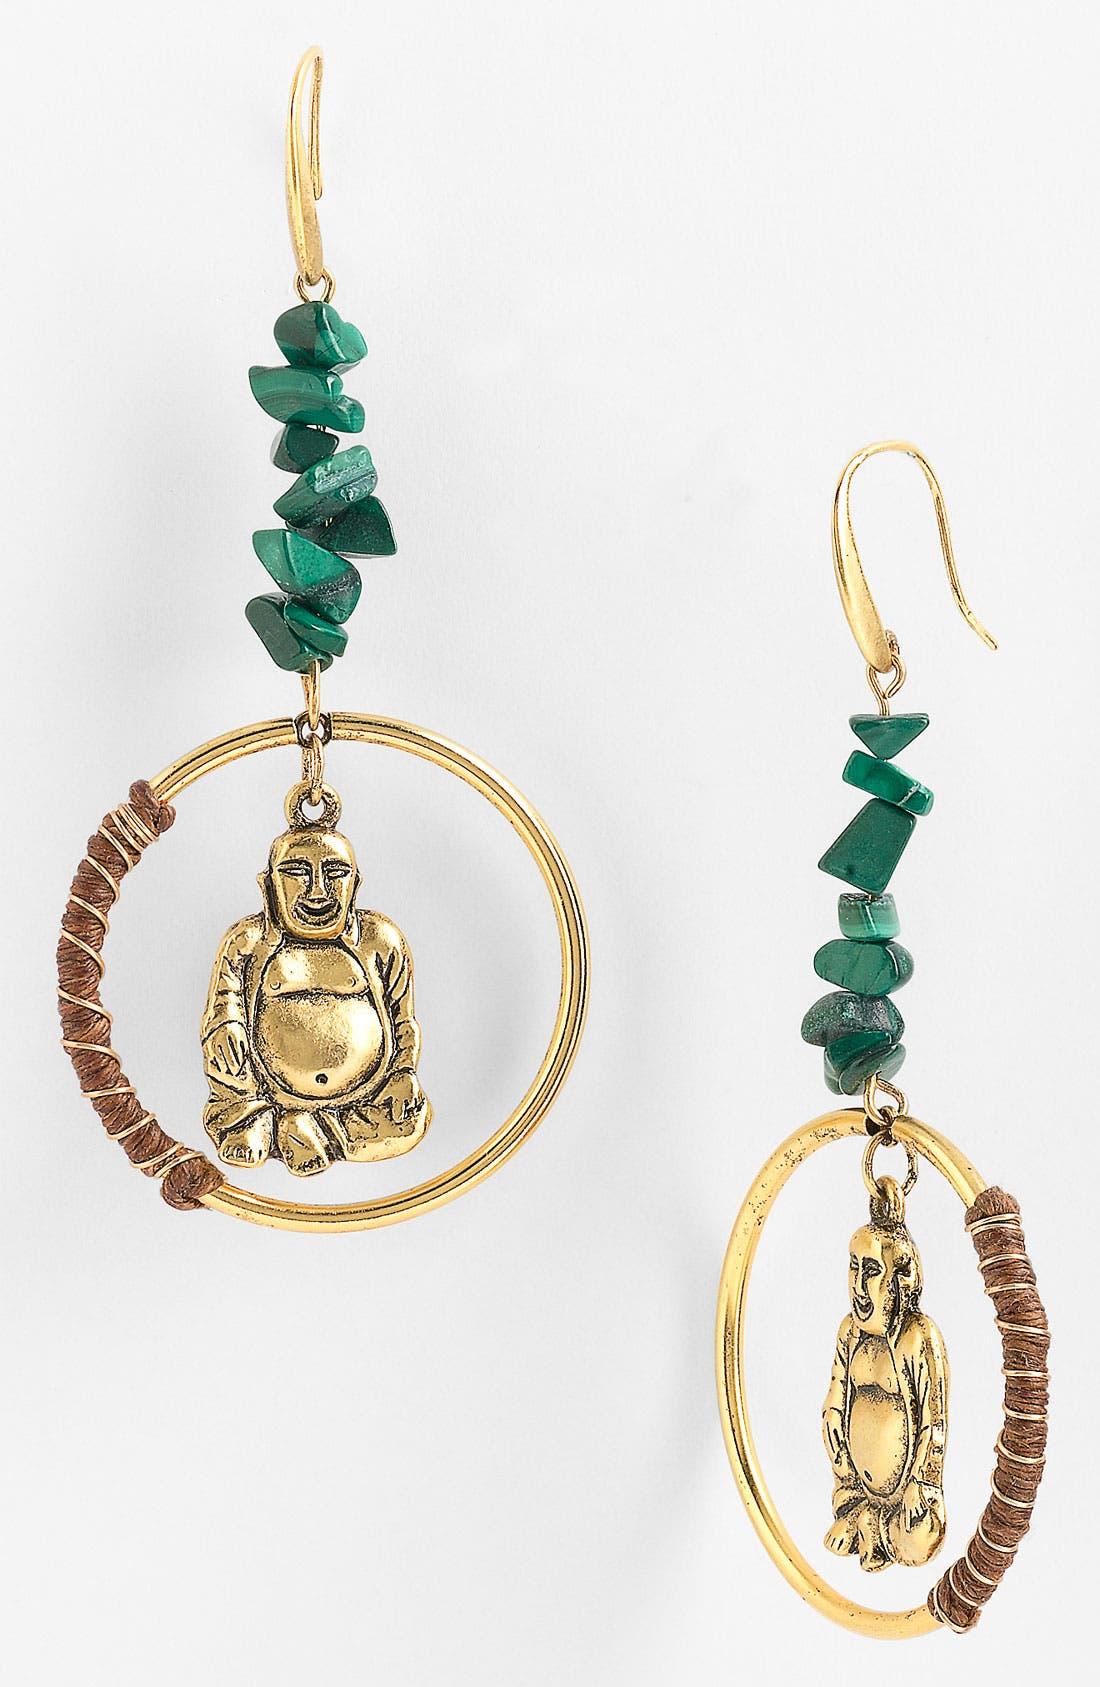 Alternate Image 1 Selected - T.R.U. Timeless Rare Unique 'Sitting Buddha' Earrings